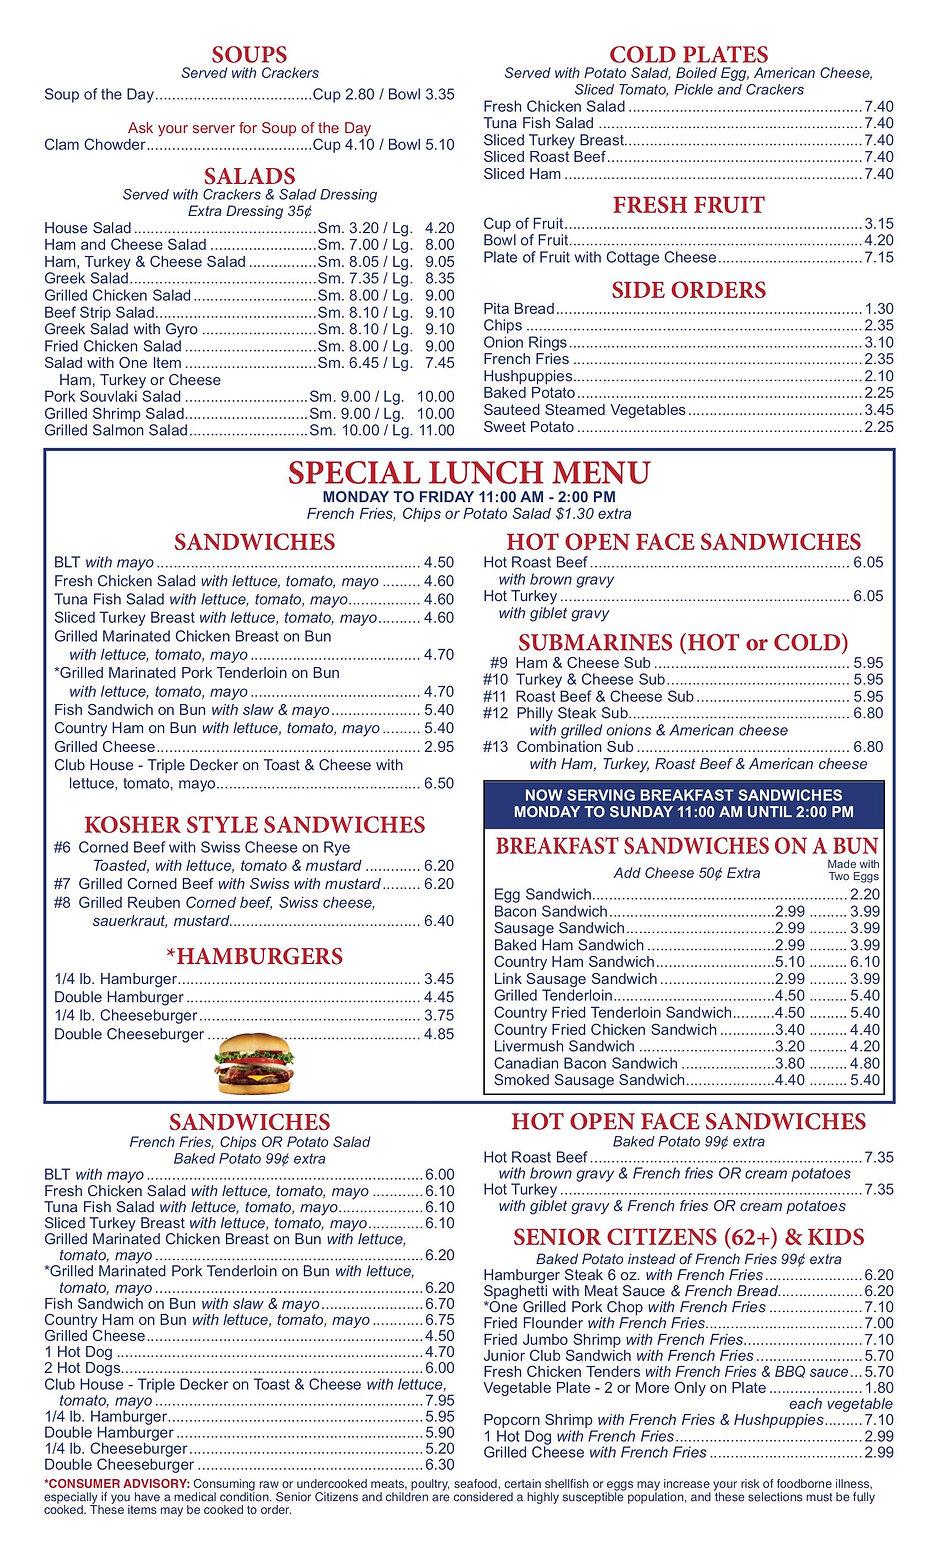 Clemmons Kitchen menu 2020.jpg